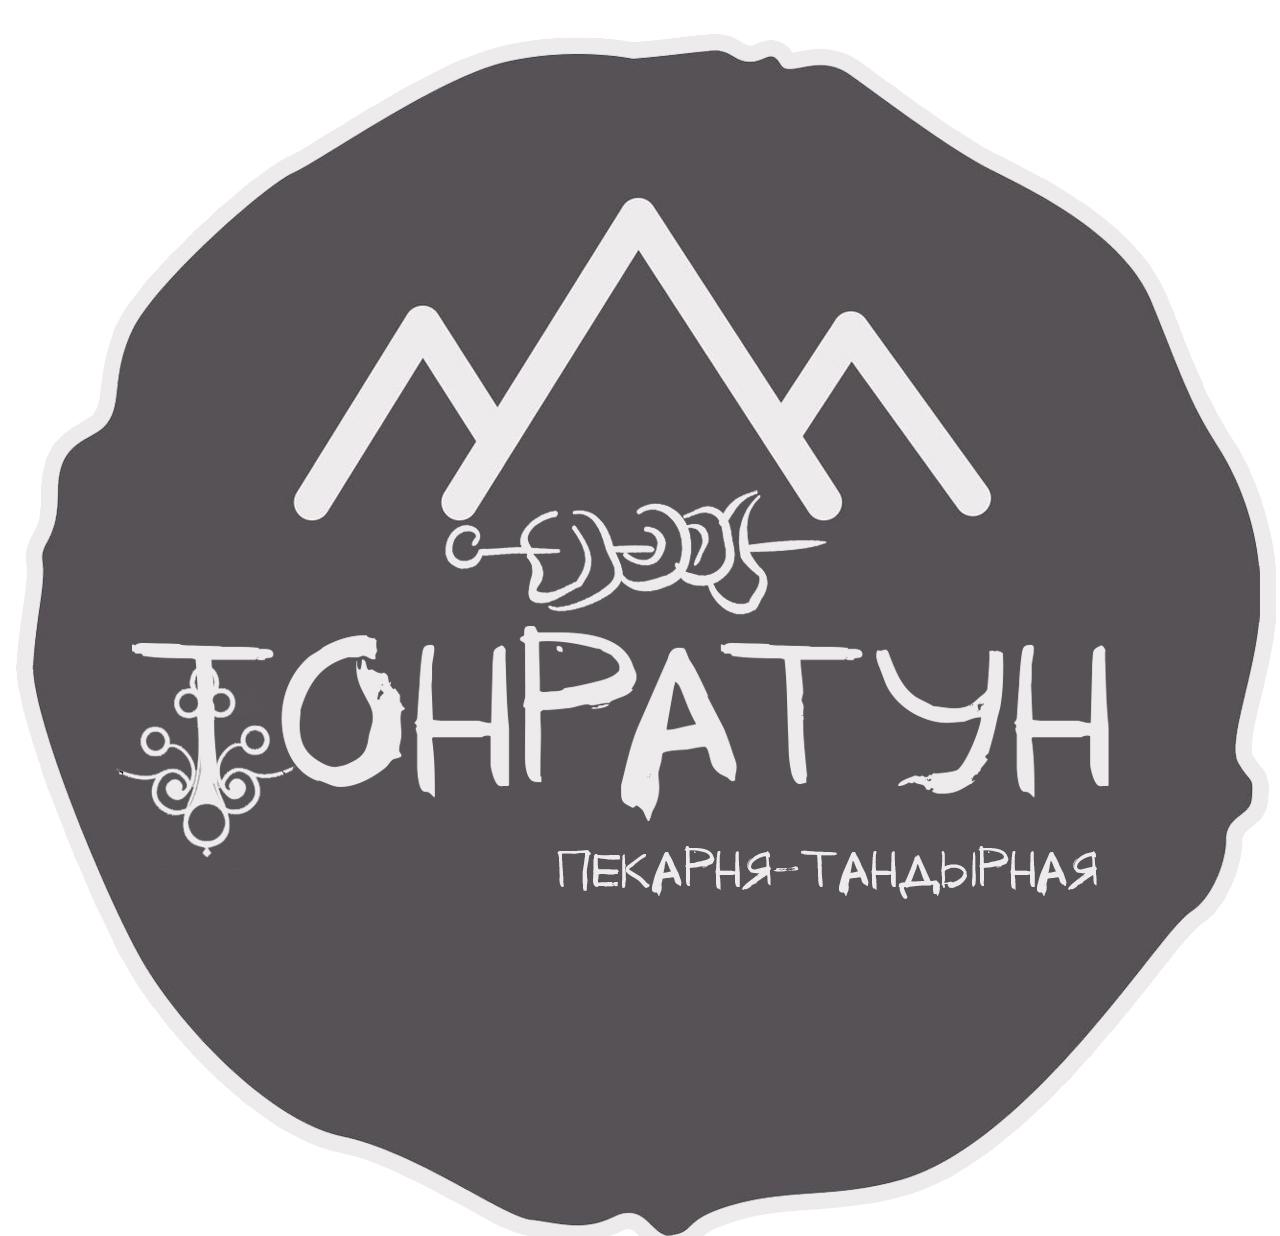 Логотип для Пекарни-Тандырной  фото f_0775d8fc6e0e4f60.jpg